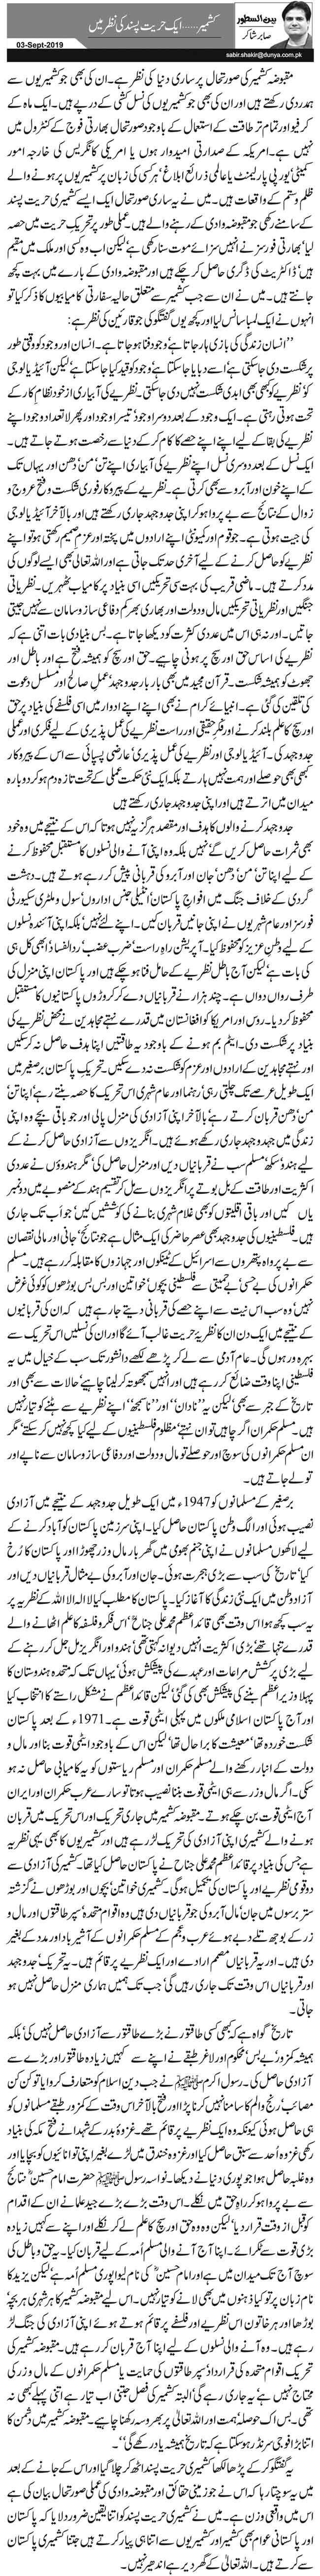 Sabir Shakir column 30 August 2019